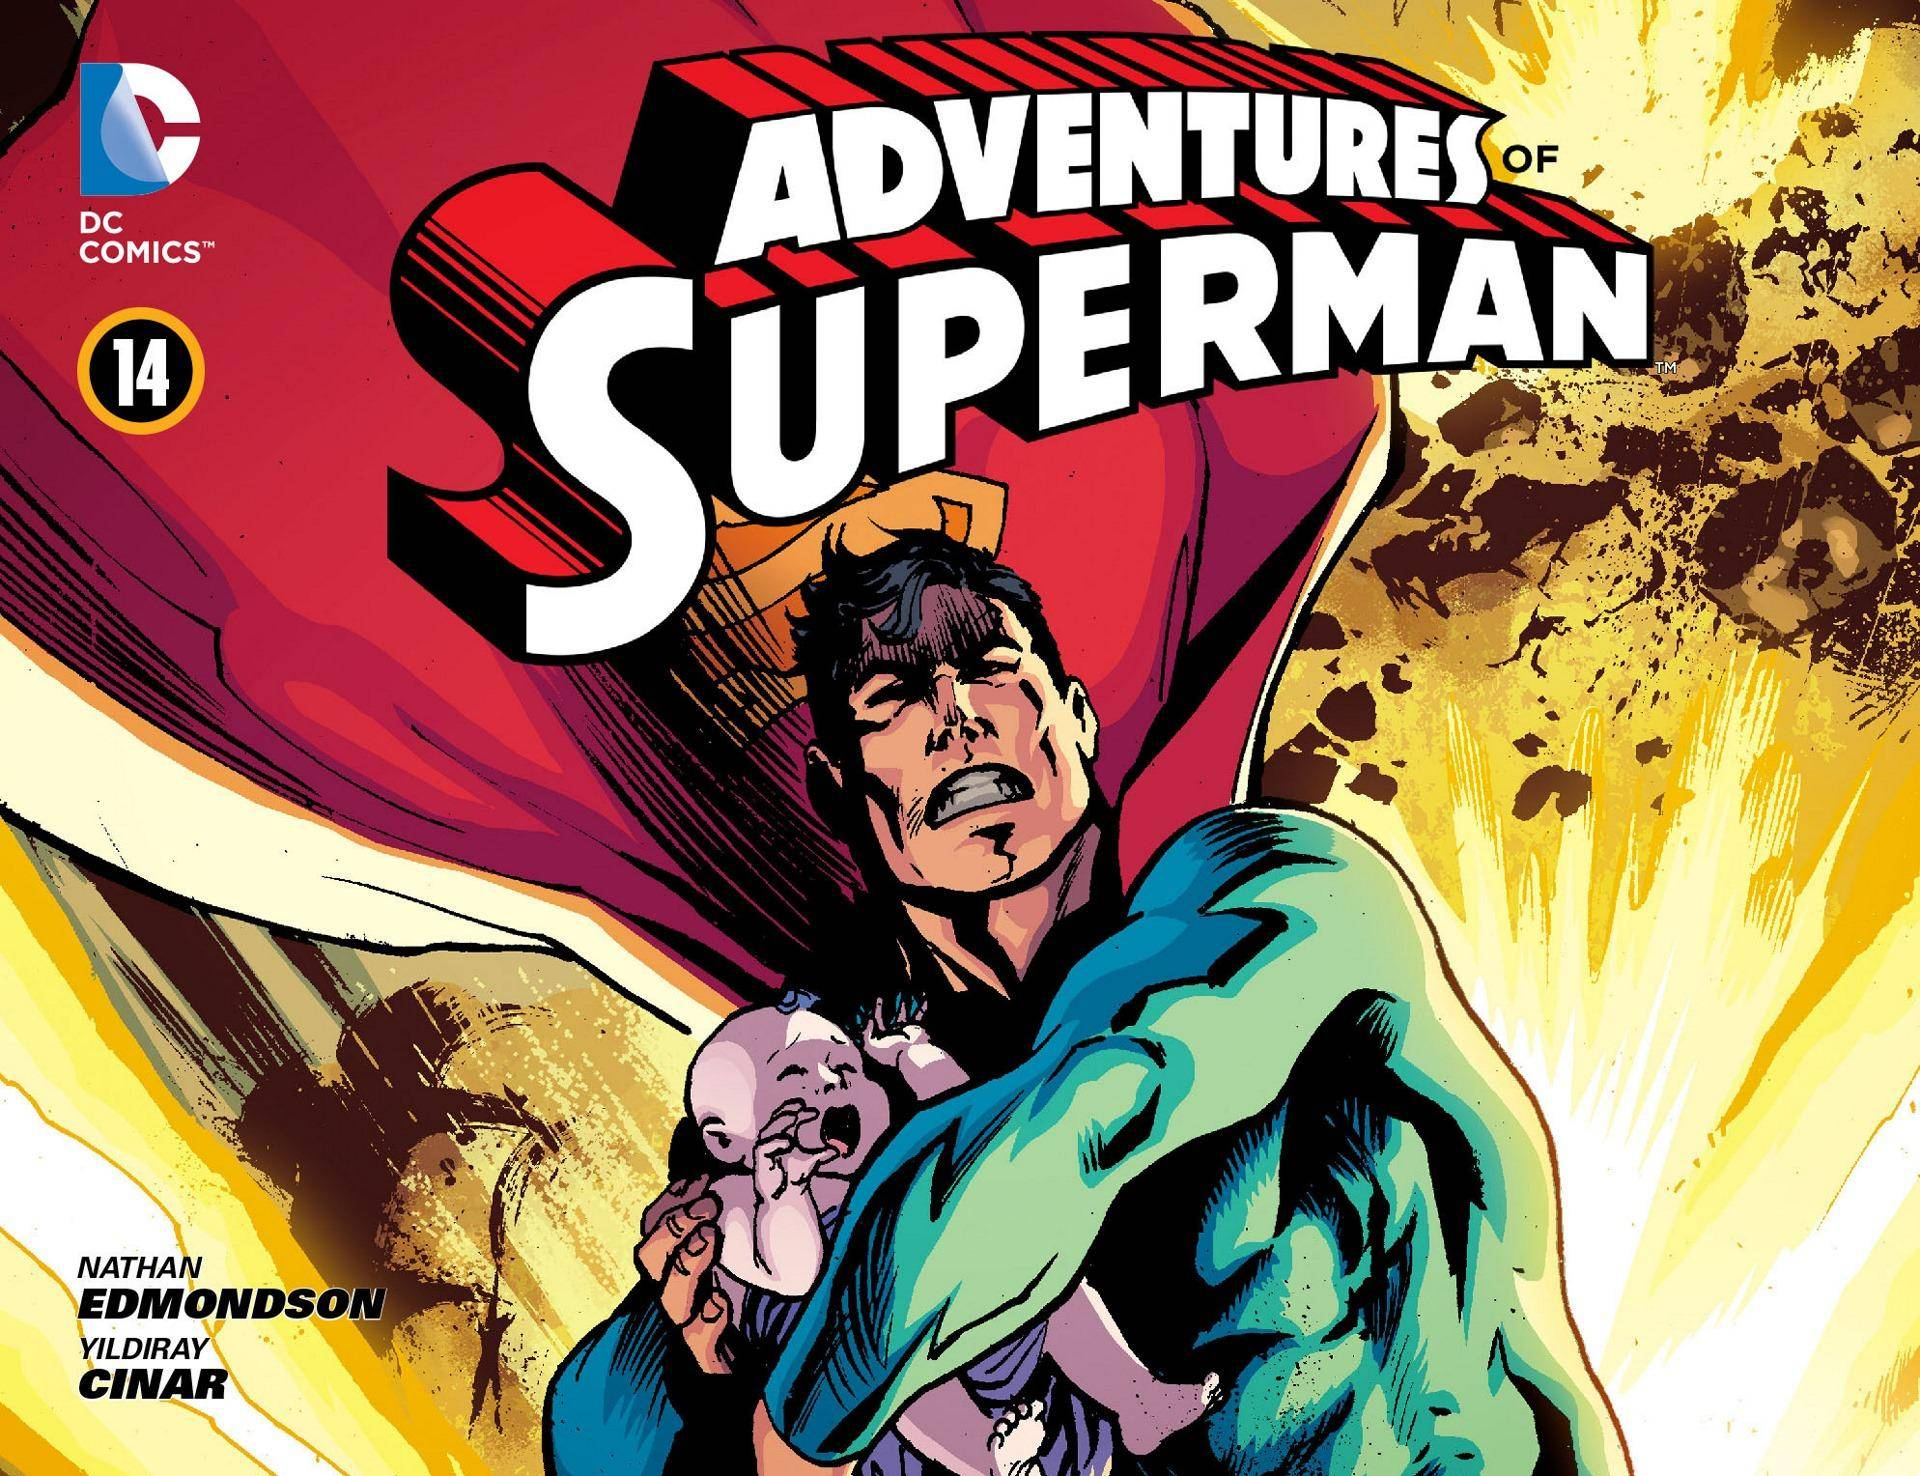 Adventures of Superman 014 2013 Digital